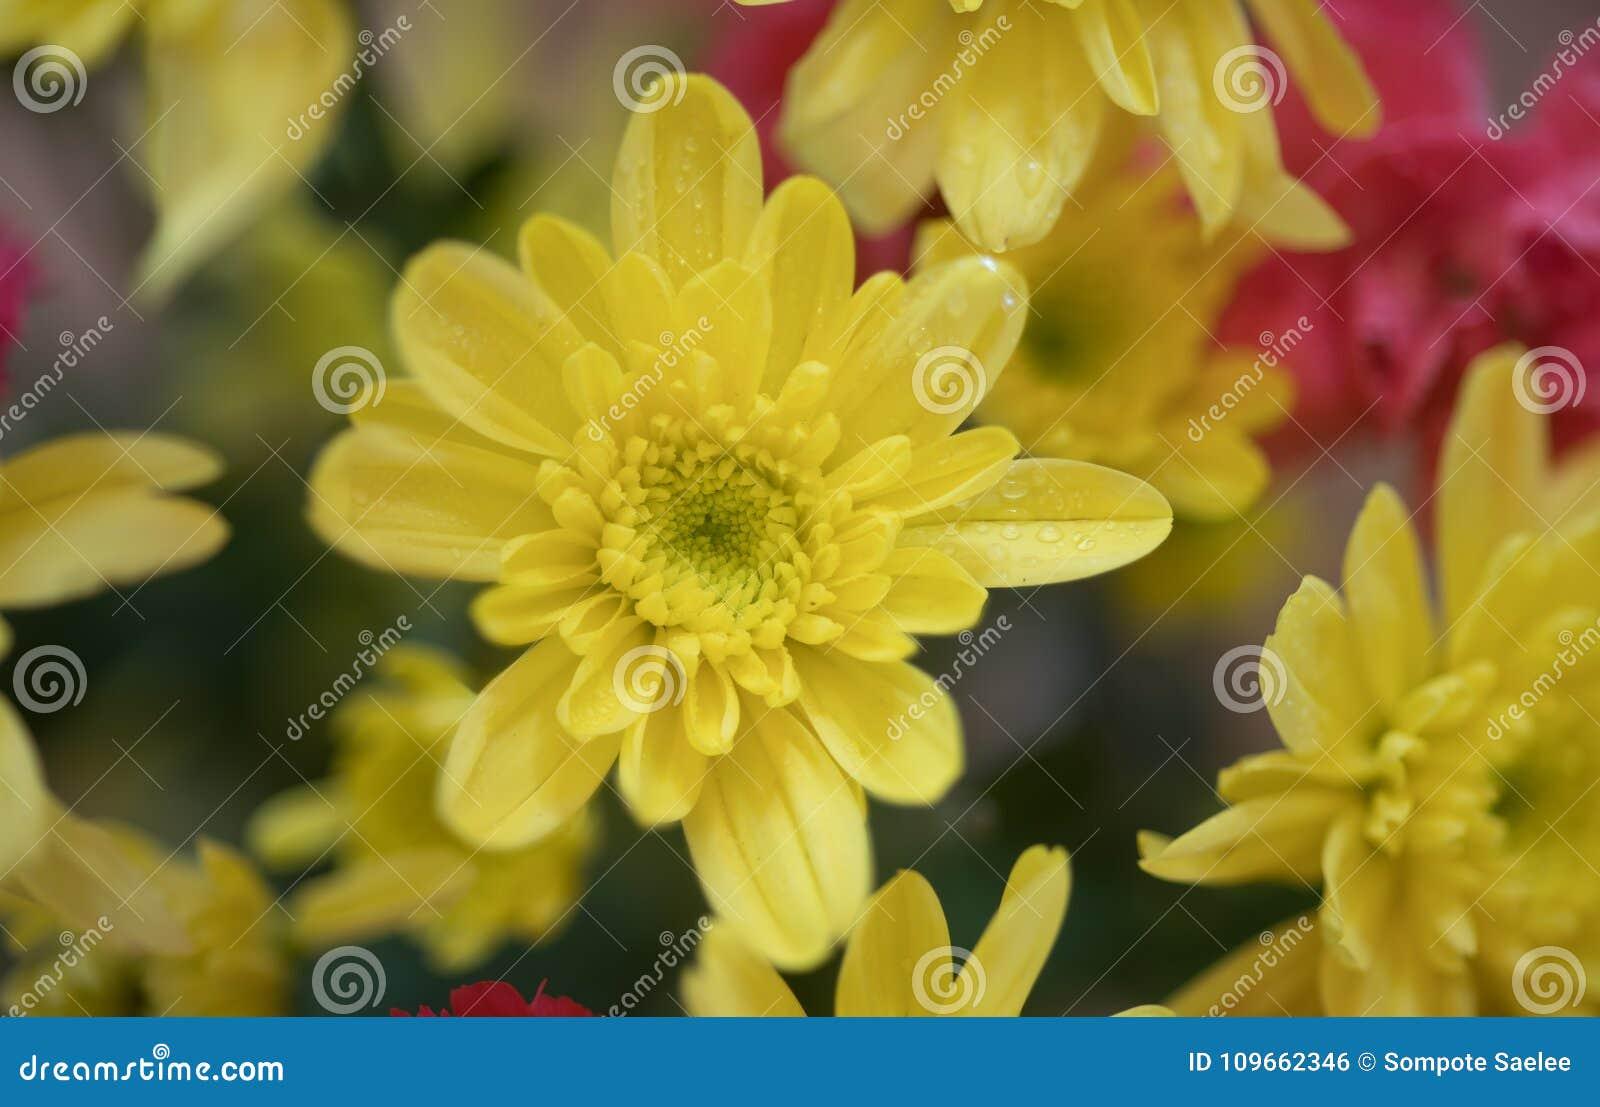 Close Up Photography Of Yellow Chrysanthemum Flowers Stock Photo